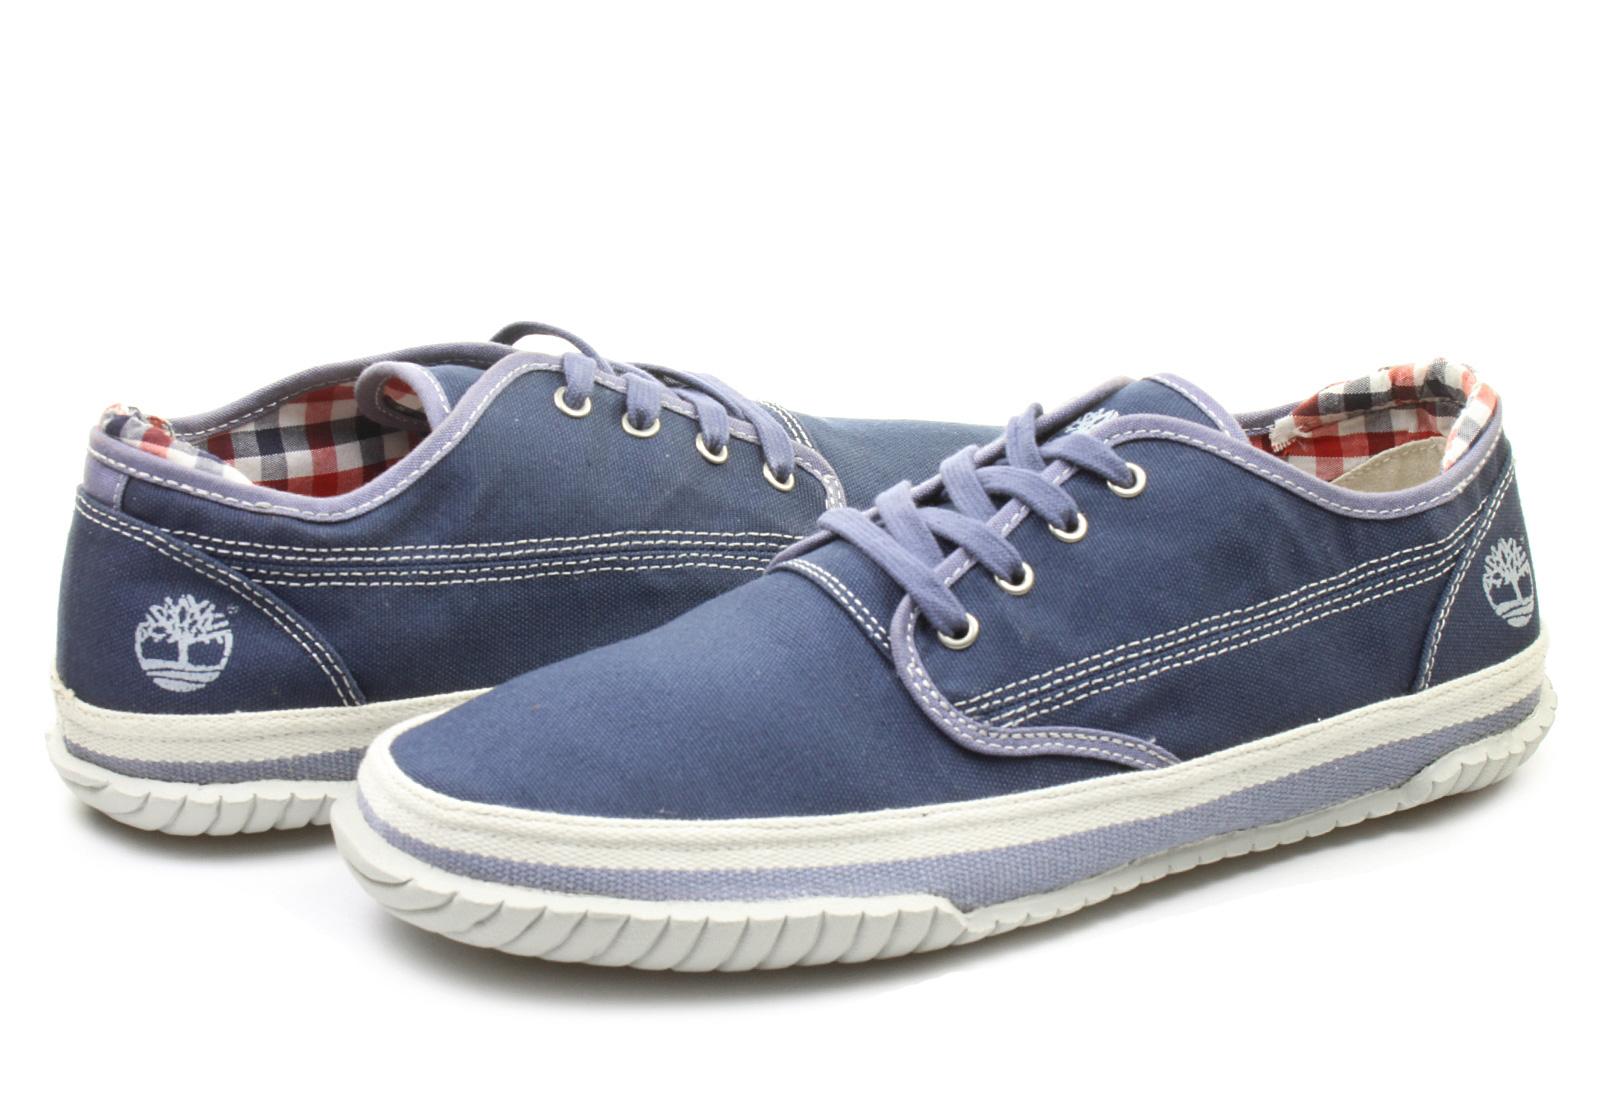 e469132d7f1a Timberland Cipő - Kirklin Plain Toe - 9454B-nvy - Office Shoes ...